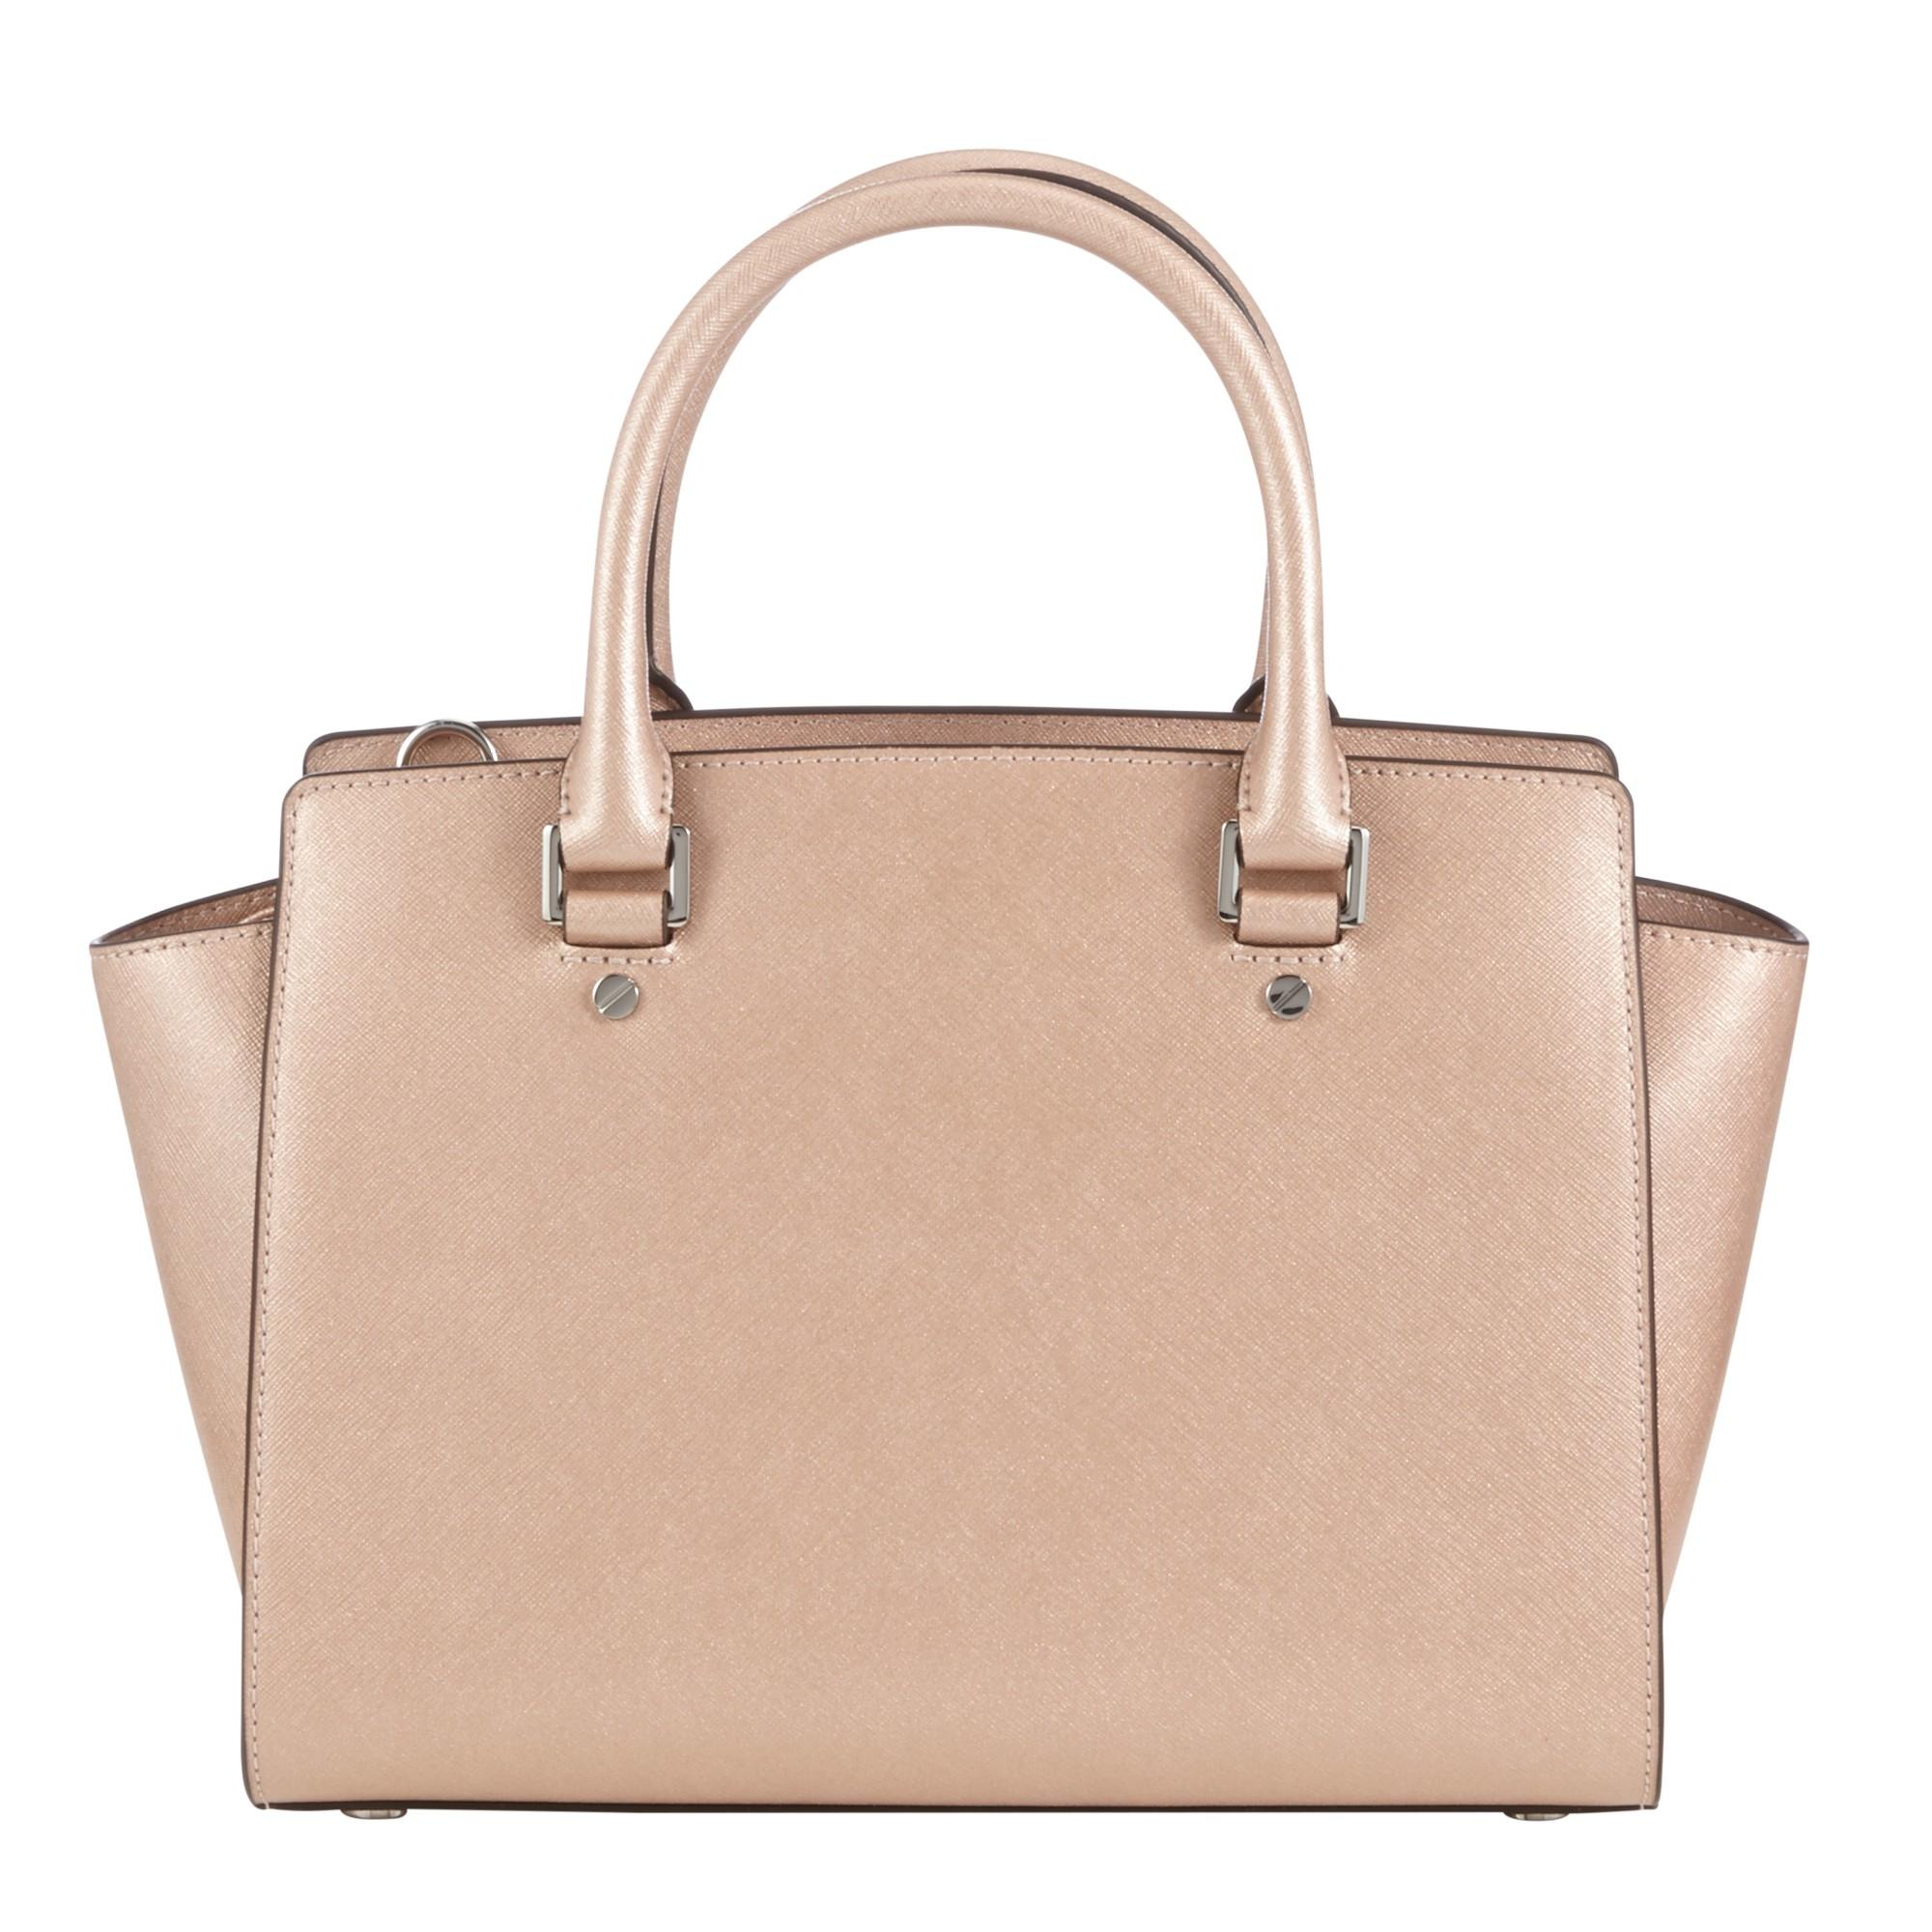 MICHAEL Michael Kors Selma Medium Top Zip Leather Satchel in Pink - Lyst 73df9e22cdfe3